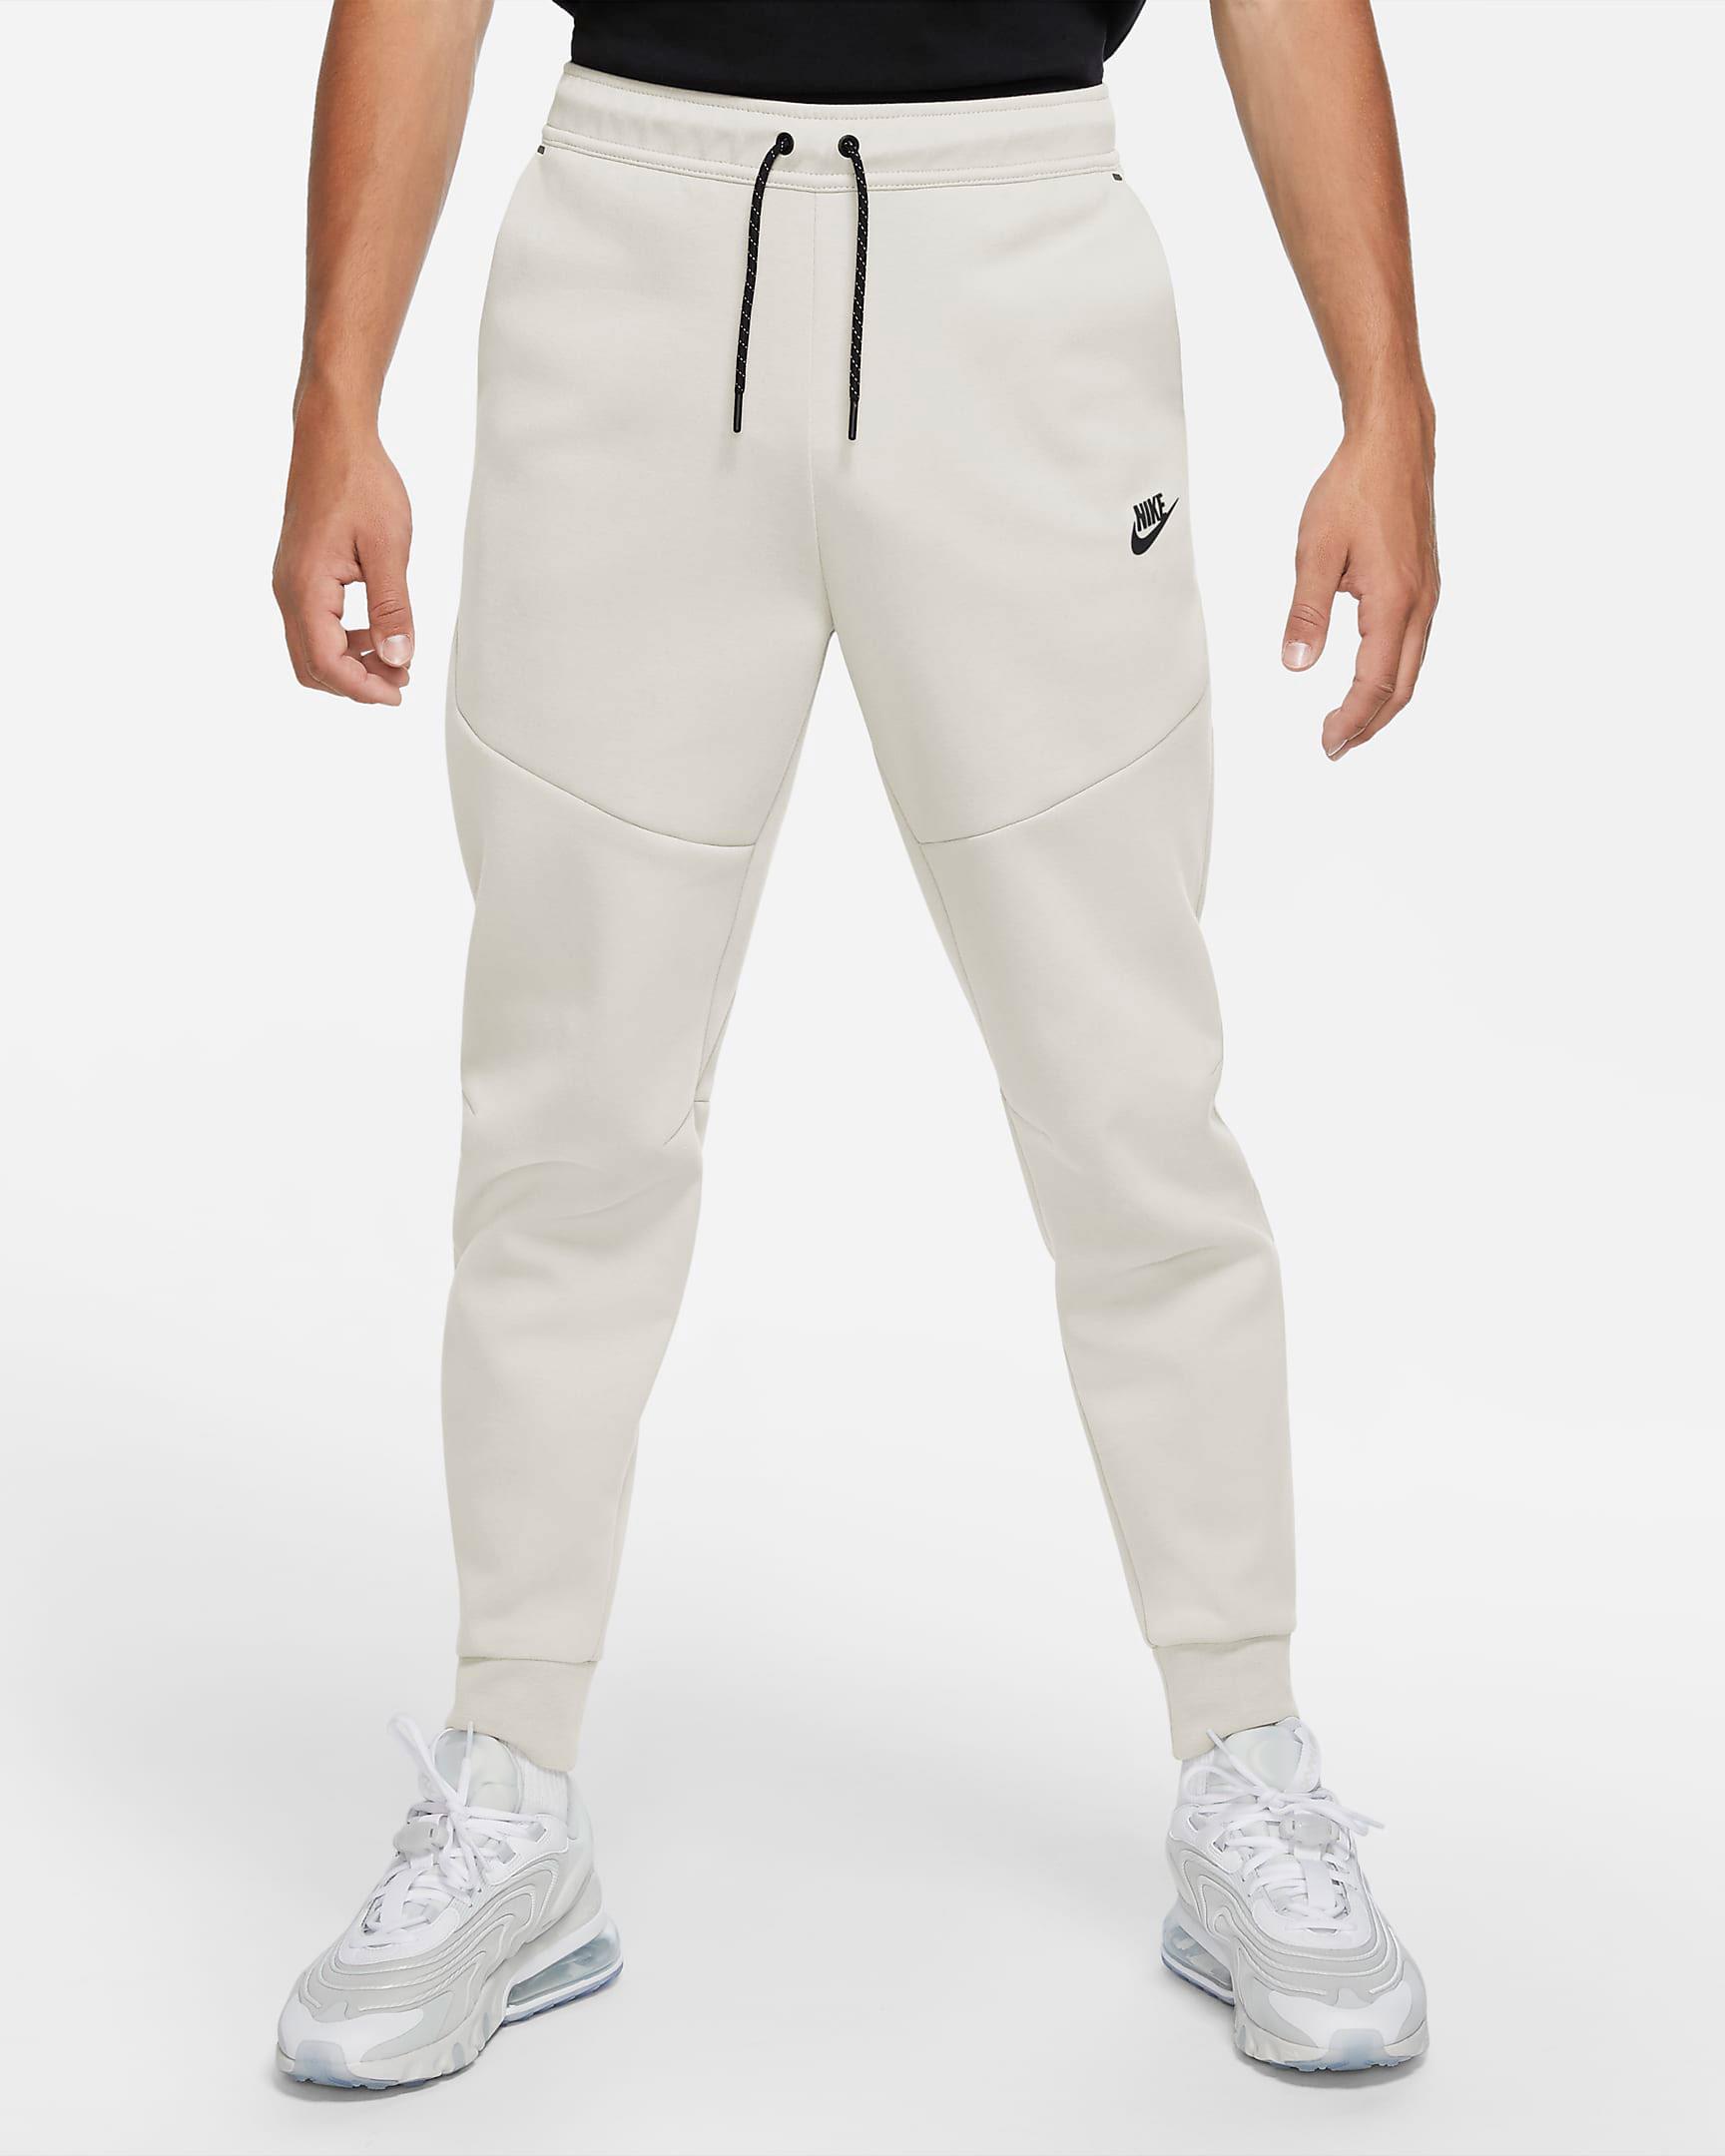 jordan-5-off-white-sail-nike-jogger-pant-match-1